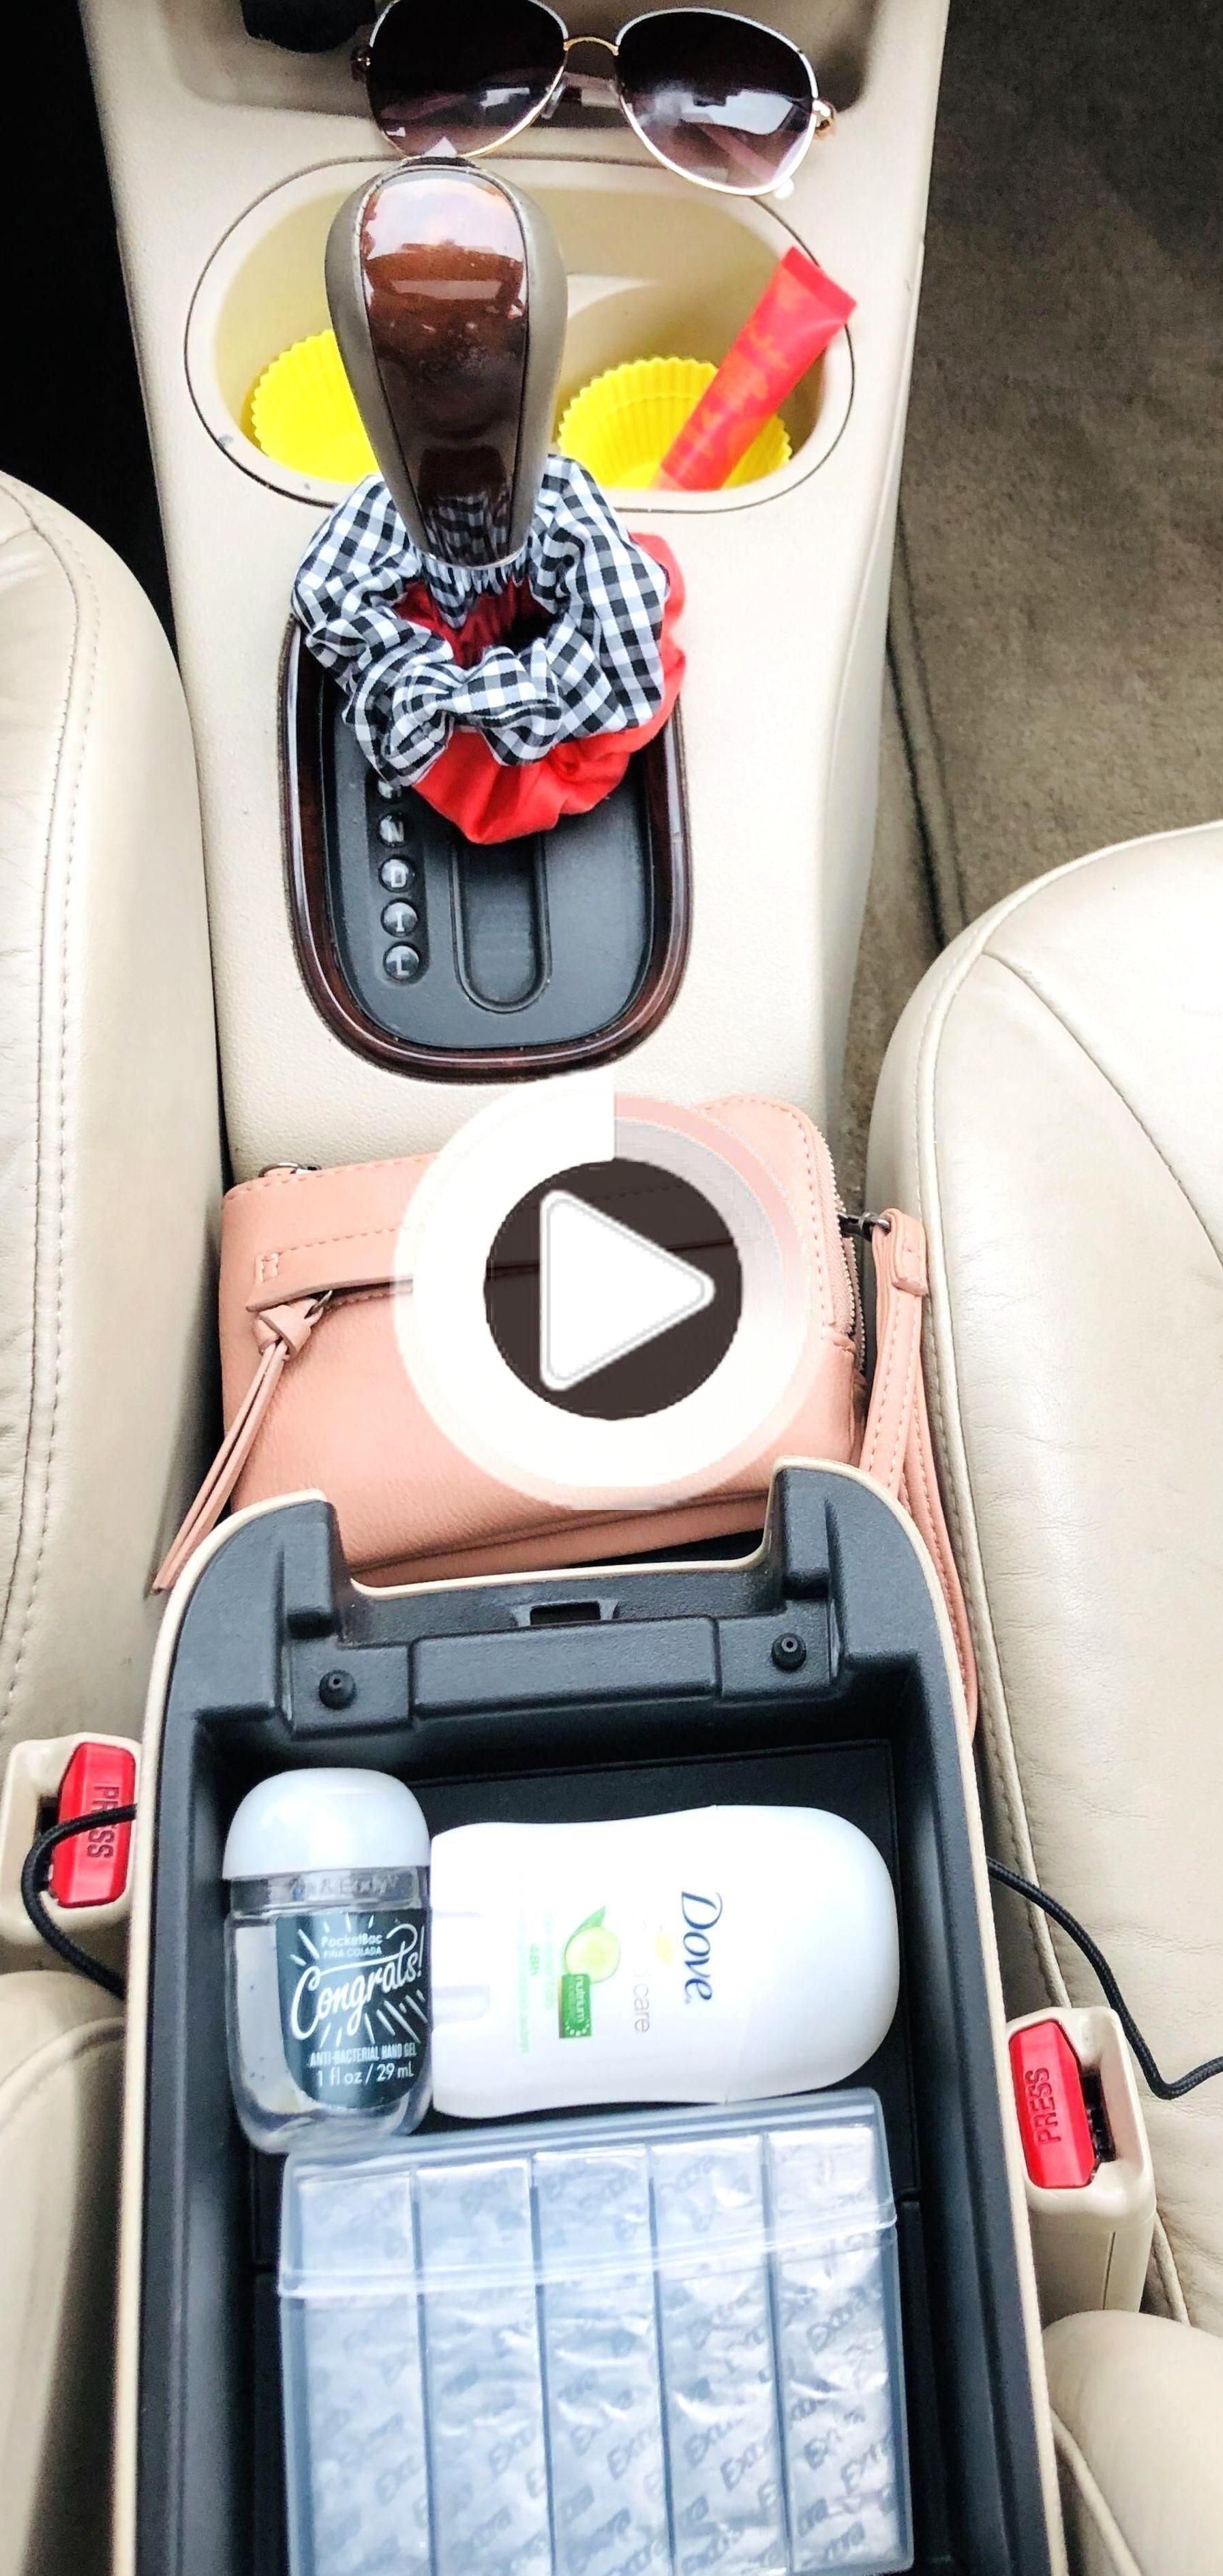 R Car Hanging Decor Car Accessories For Girls Car Essentials Preppy Car Accessories